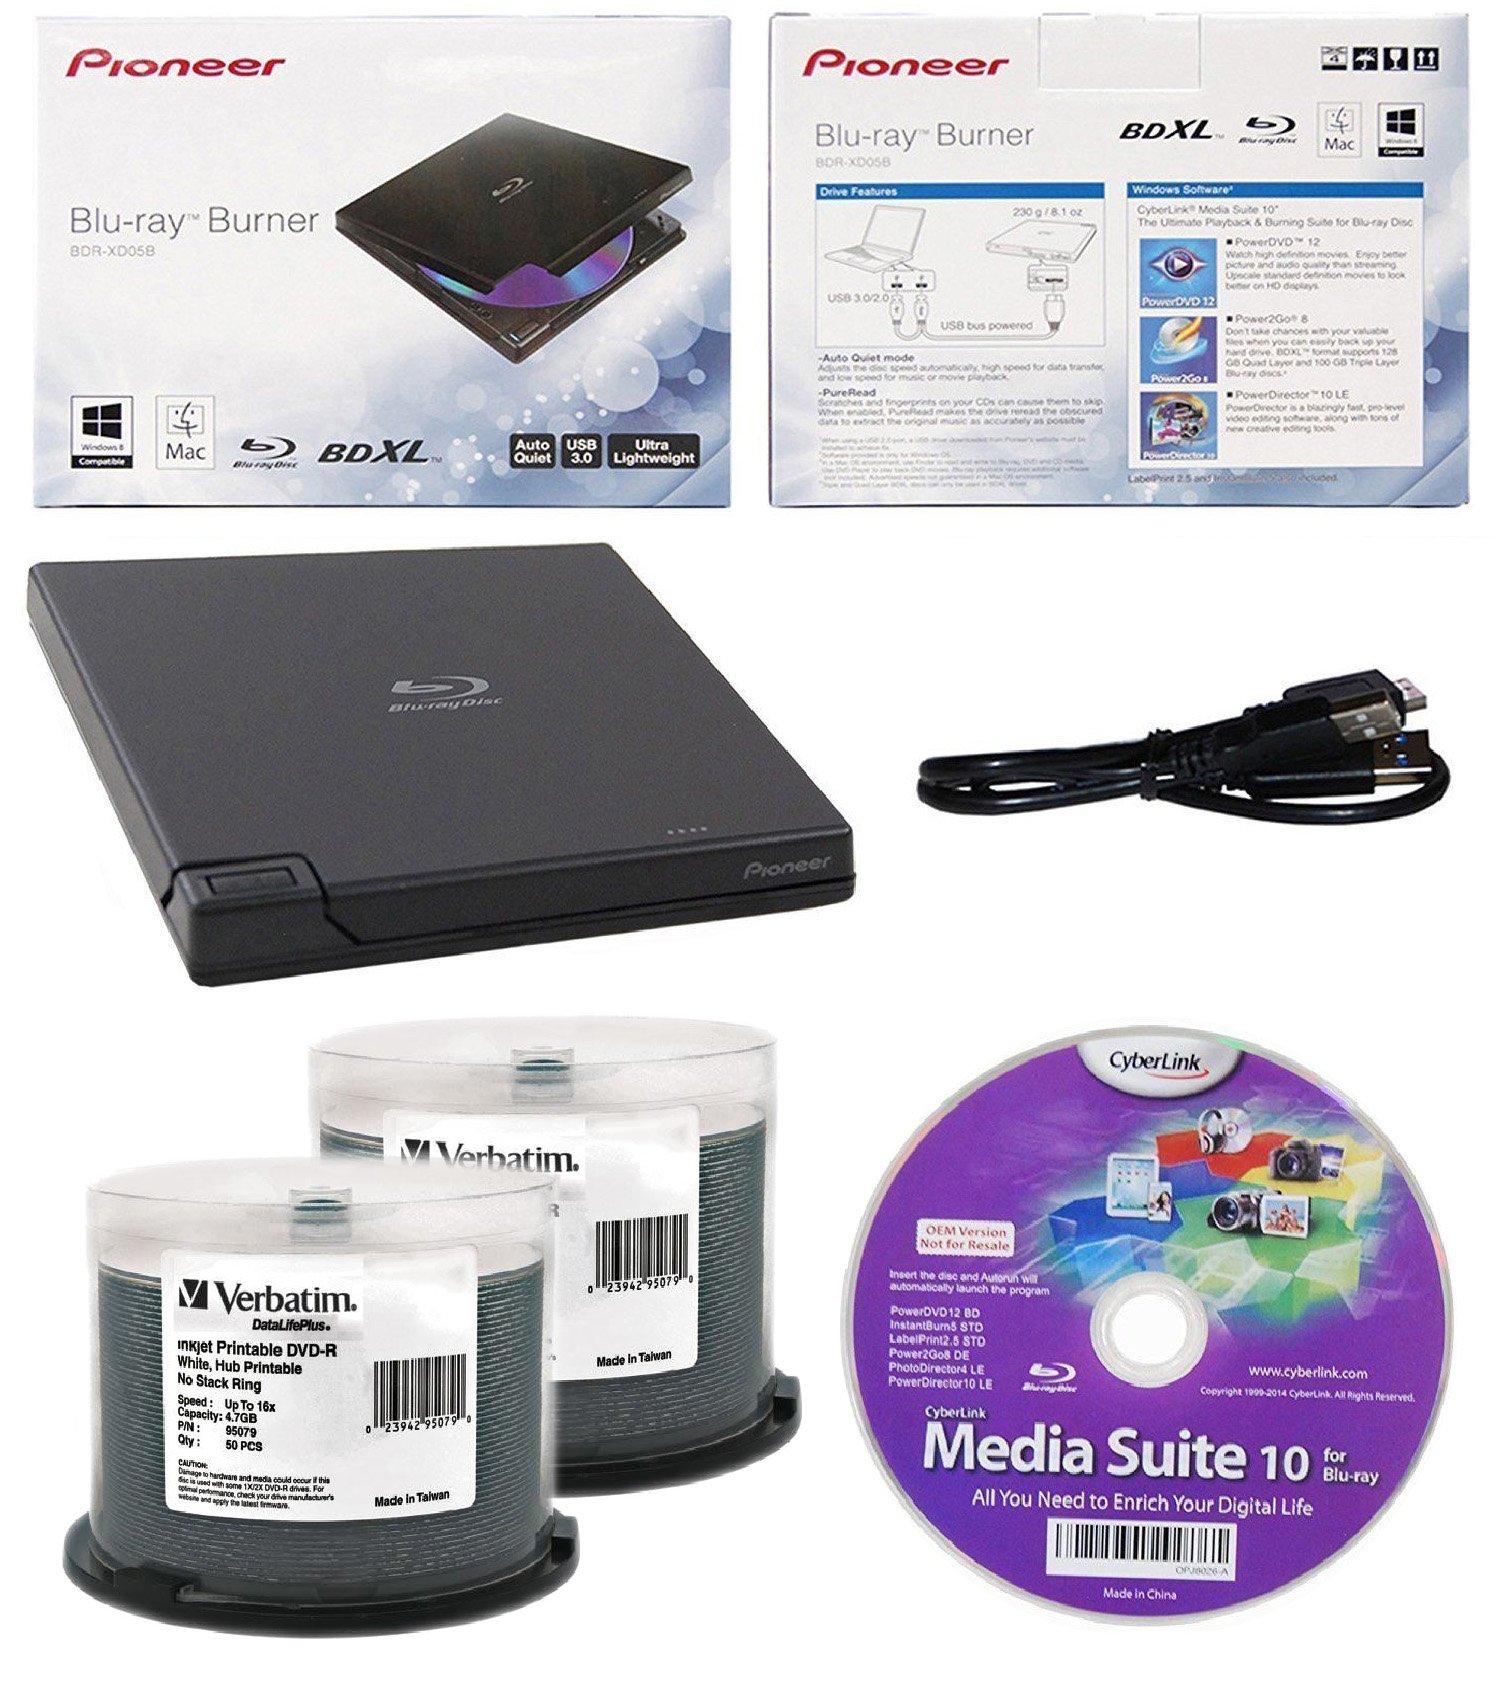 Pioneer 6x BDR-XD05B Ultra Lightweight External Blu-ray BDXL Burner, Cyberlink Software and USB Cable Bundle with 100pk DVD-R Verbatim 4.7GB 16X DataLifePlus White Inkjet, Hub Printable